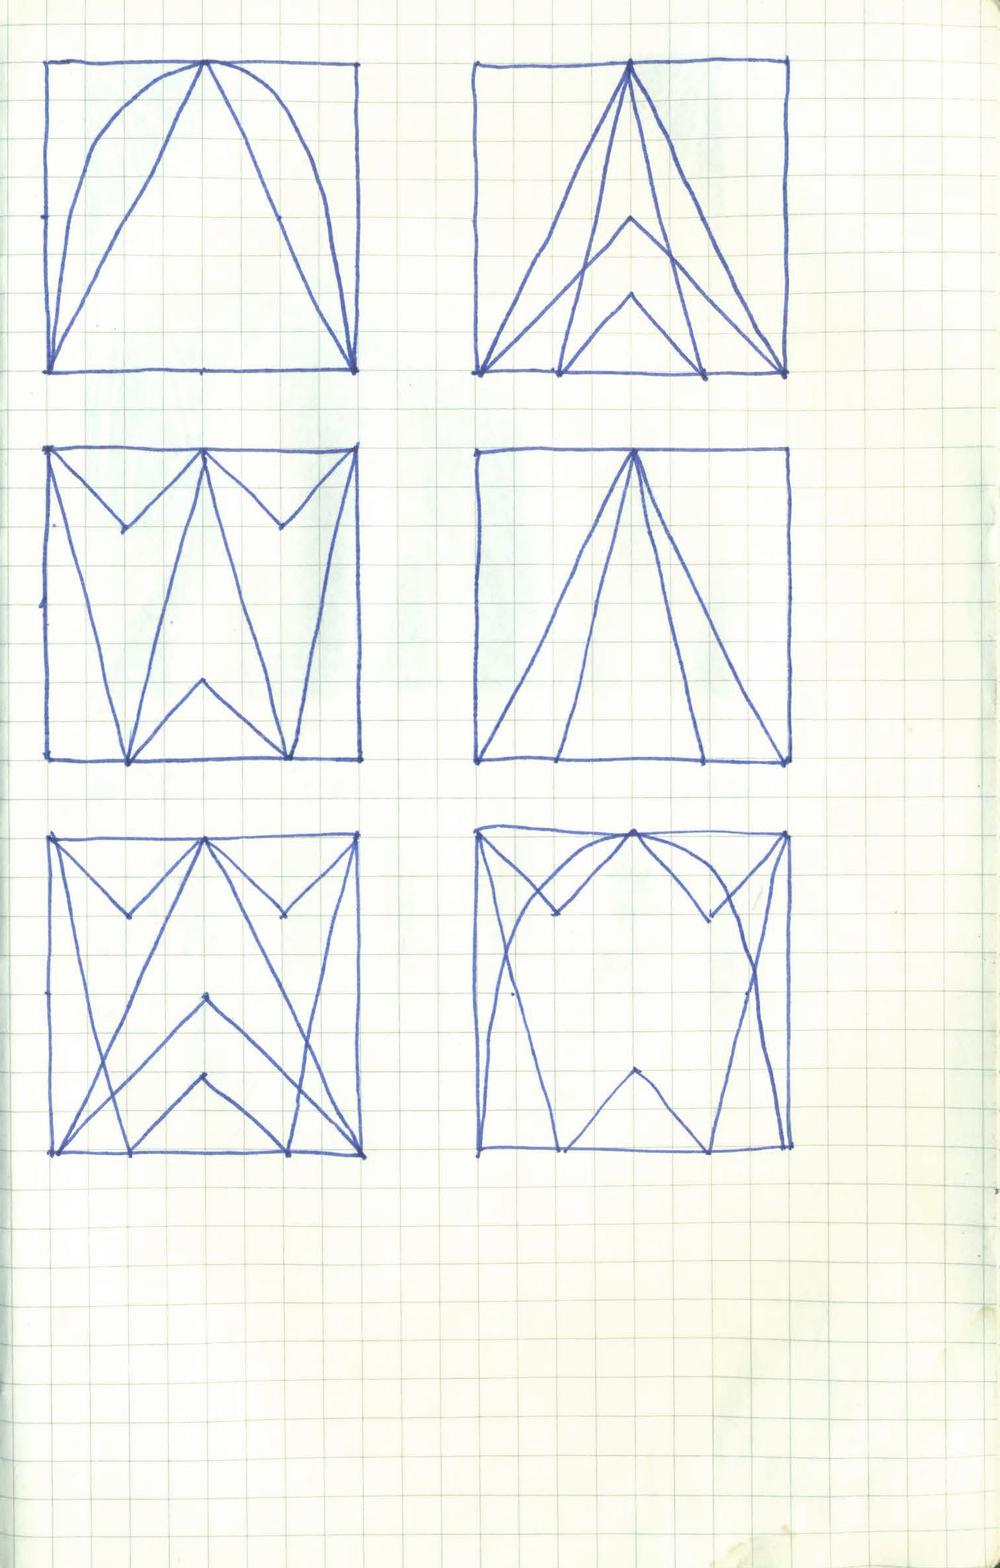 Drawing_39_c.jpg